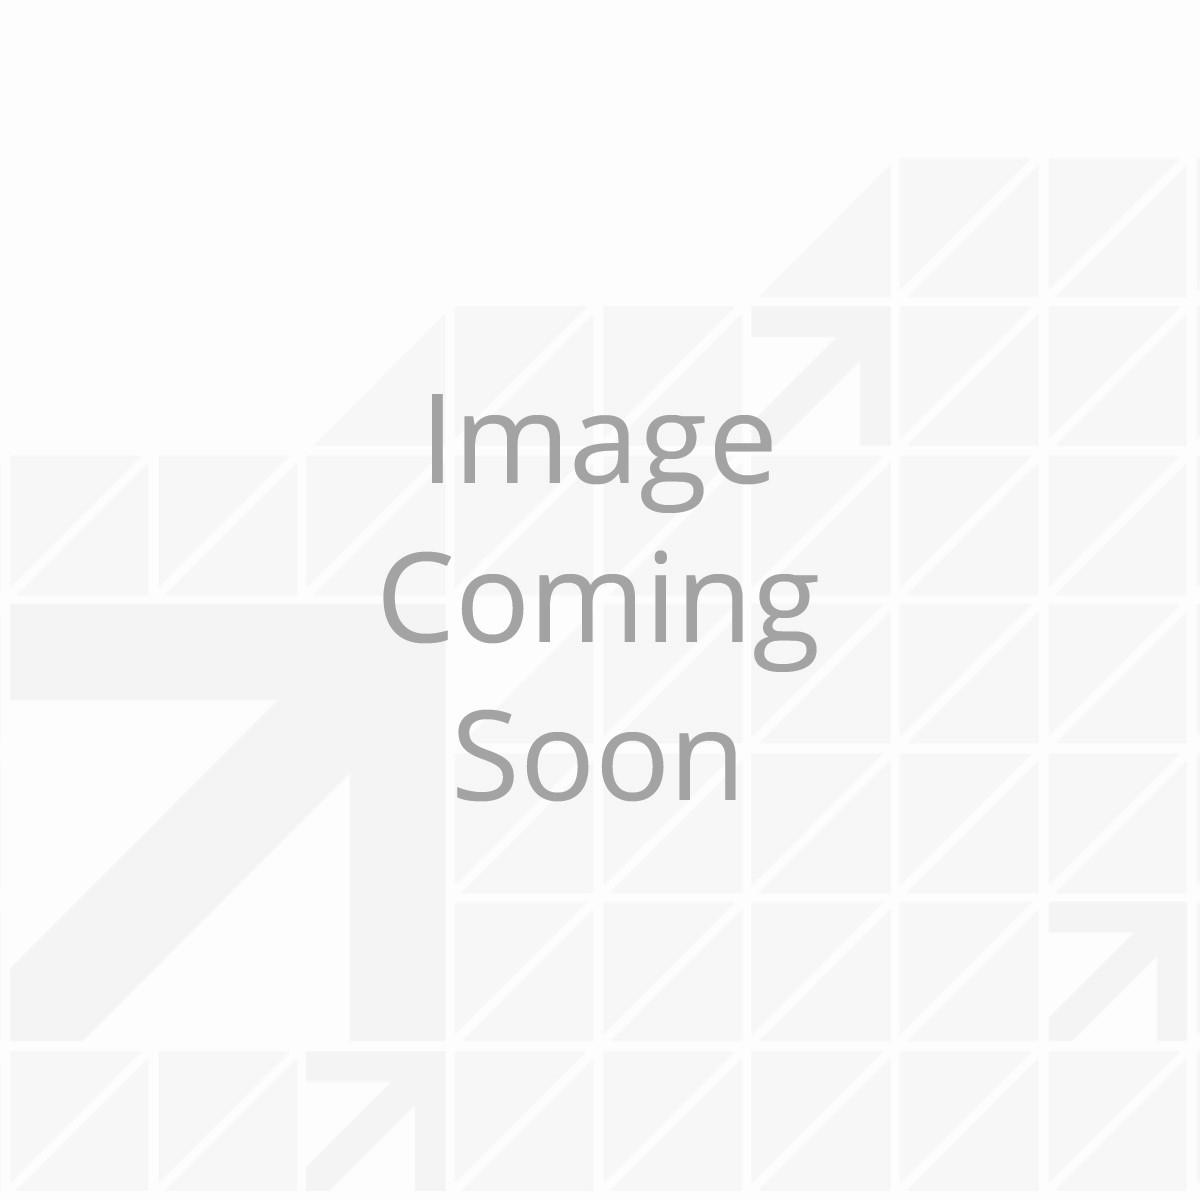 160116_-_washer_-_001